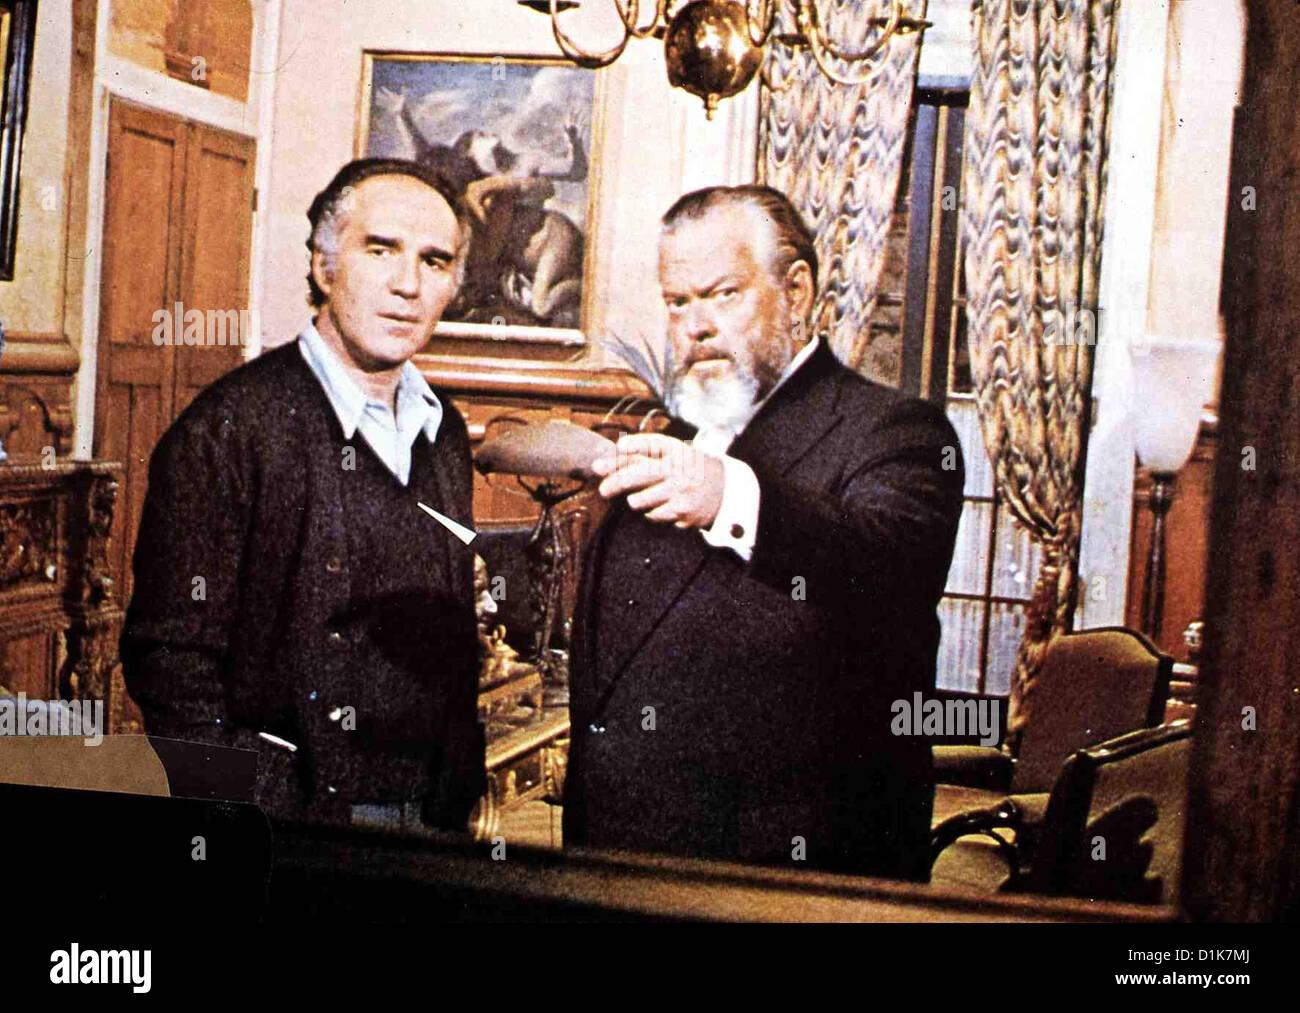 Der Zehnte Tag Jahrzehnt Prodigieuse, La Paul Regis (Michel Piccoli), Theo Van Horn (Orson Welles) *** lokalen Caption Stockbild